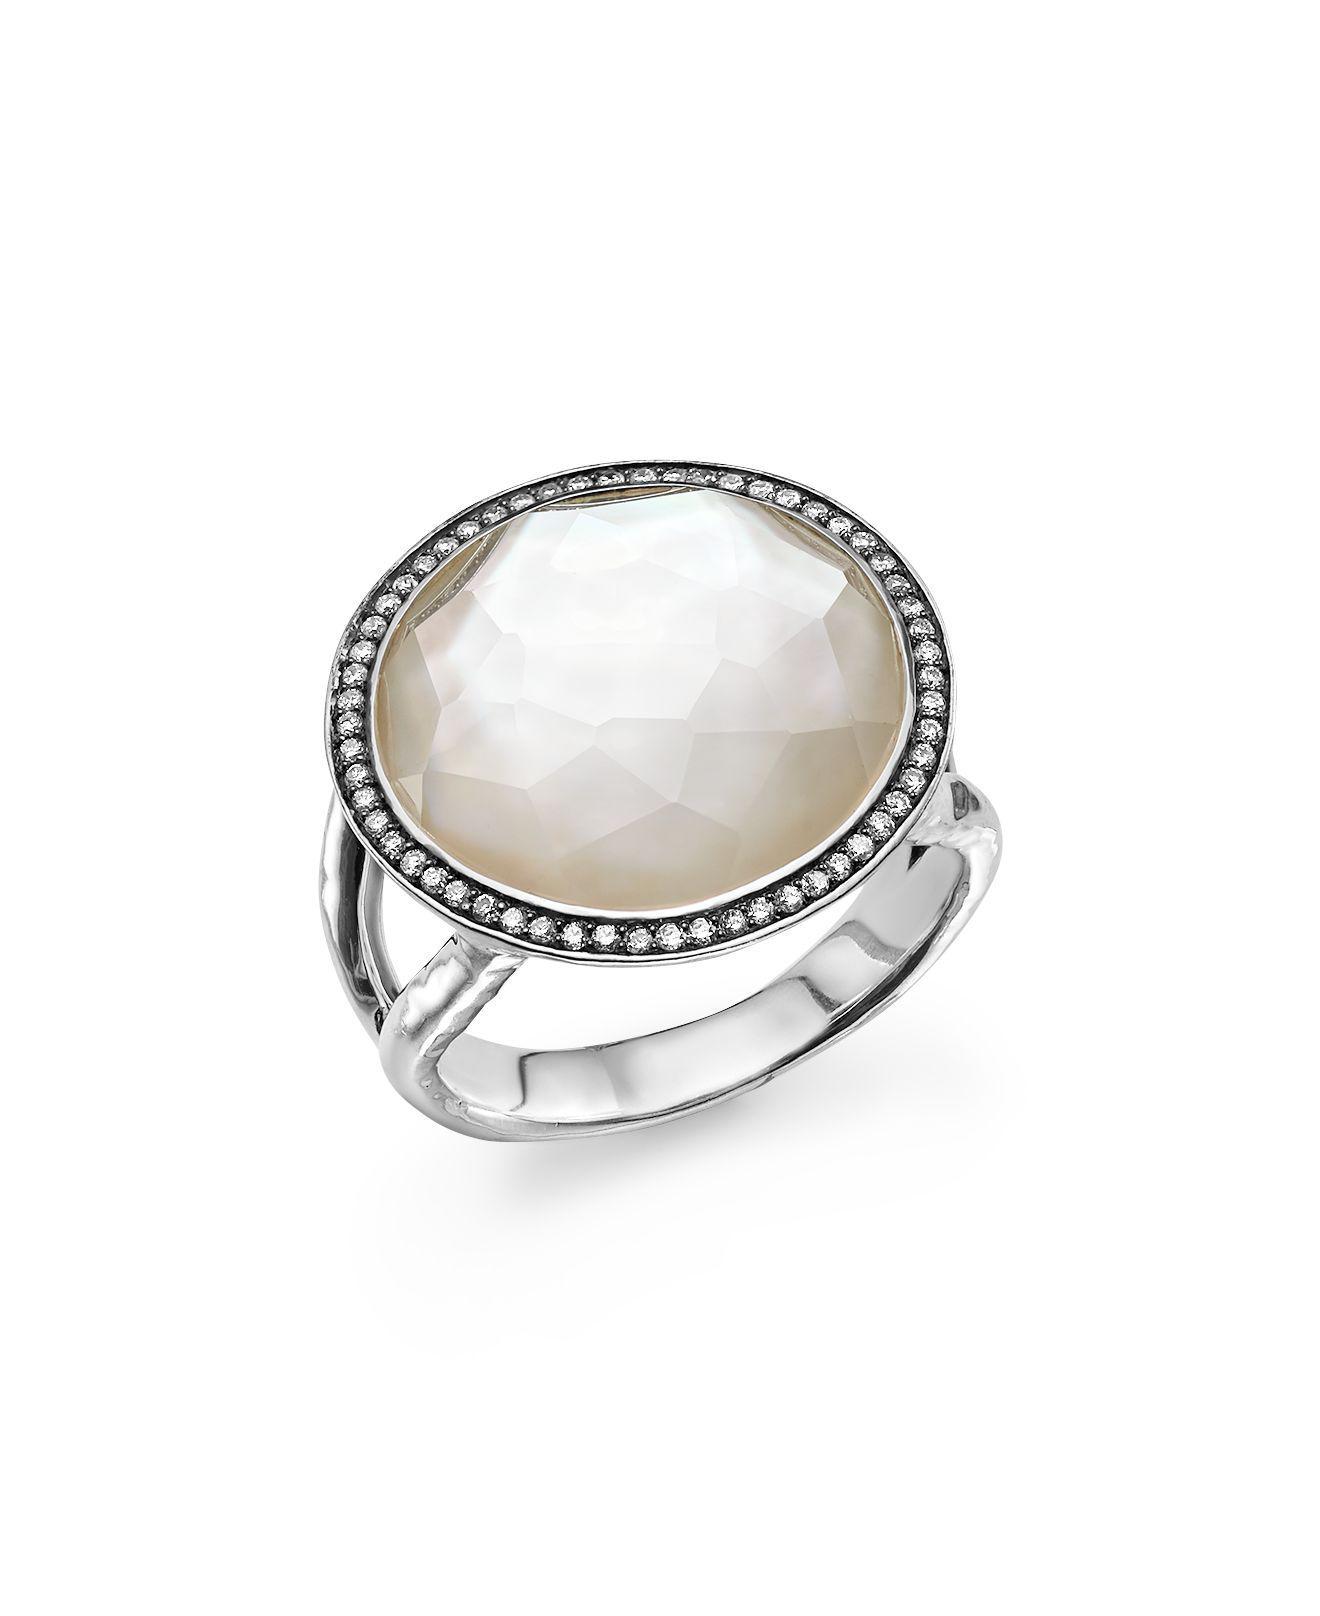 Ippolita Small Diamond-Bezel Mother-of-Pearl Lollipop Ring aGFlx8NxDc